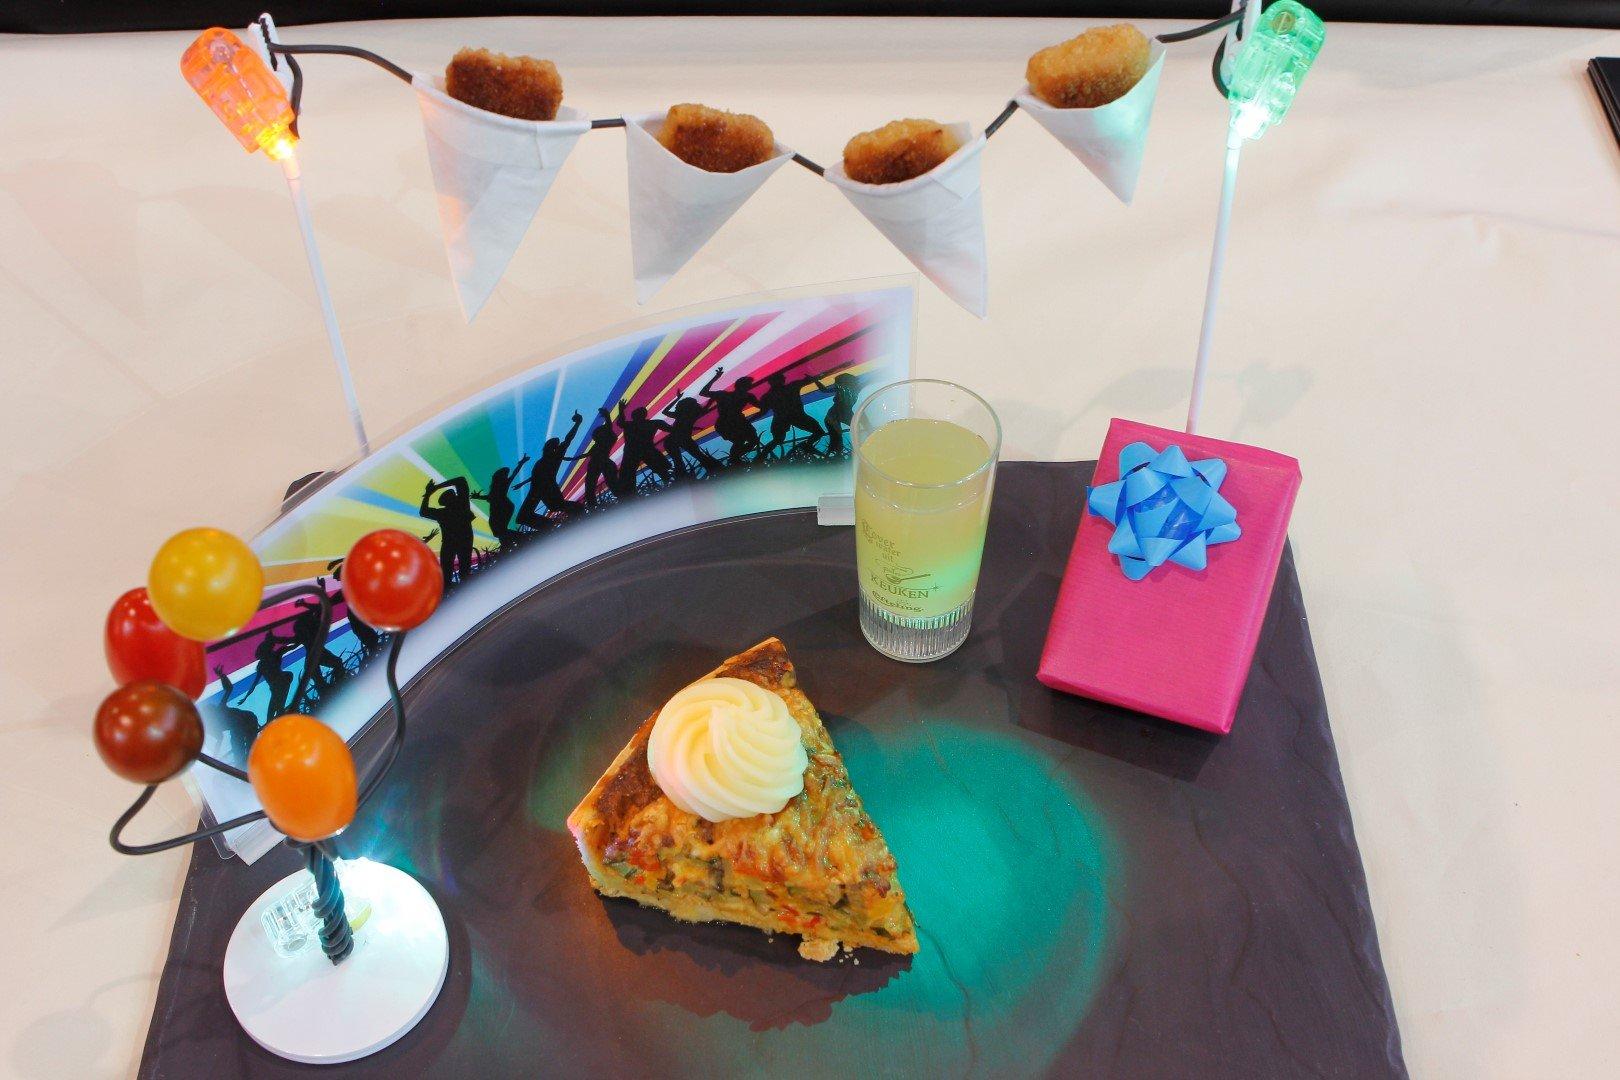 Lekkerste kindermenu kinderjury lekkerste wedstrijden horecava 2015 foodblog Foodinista